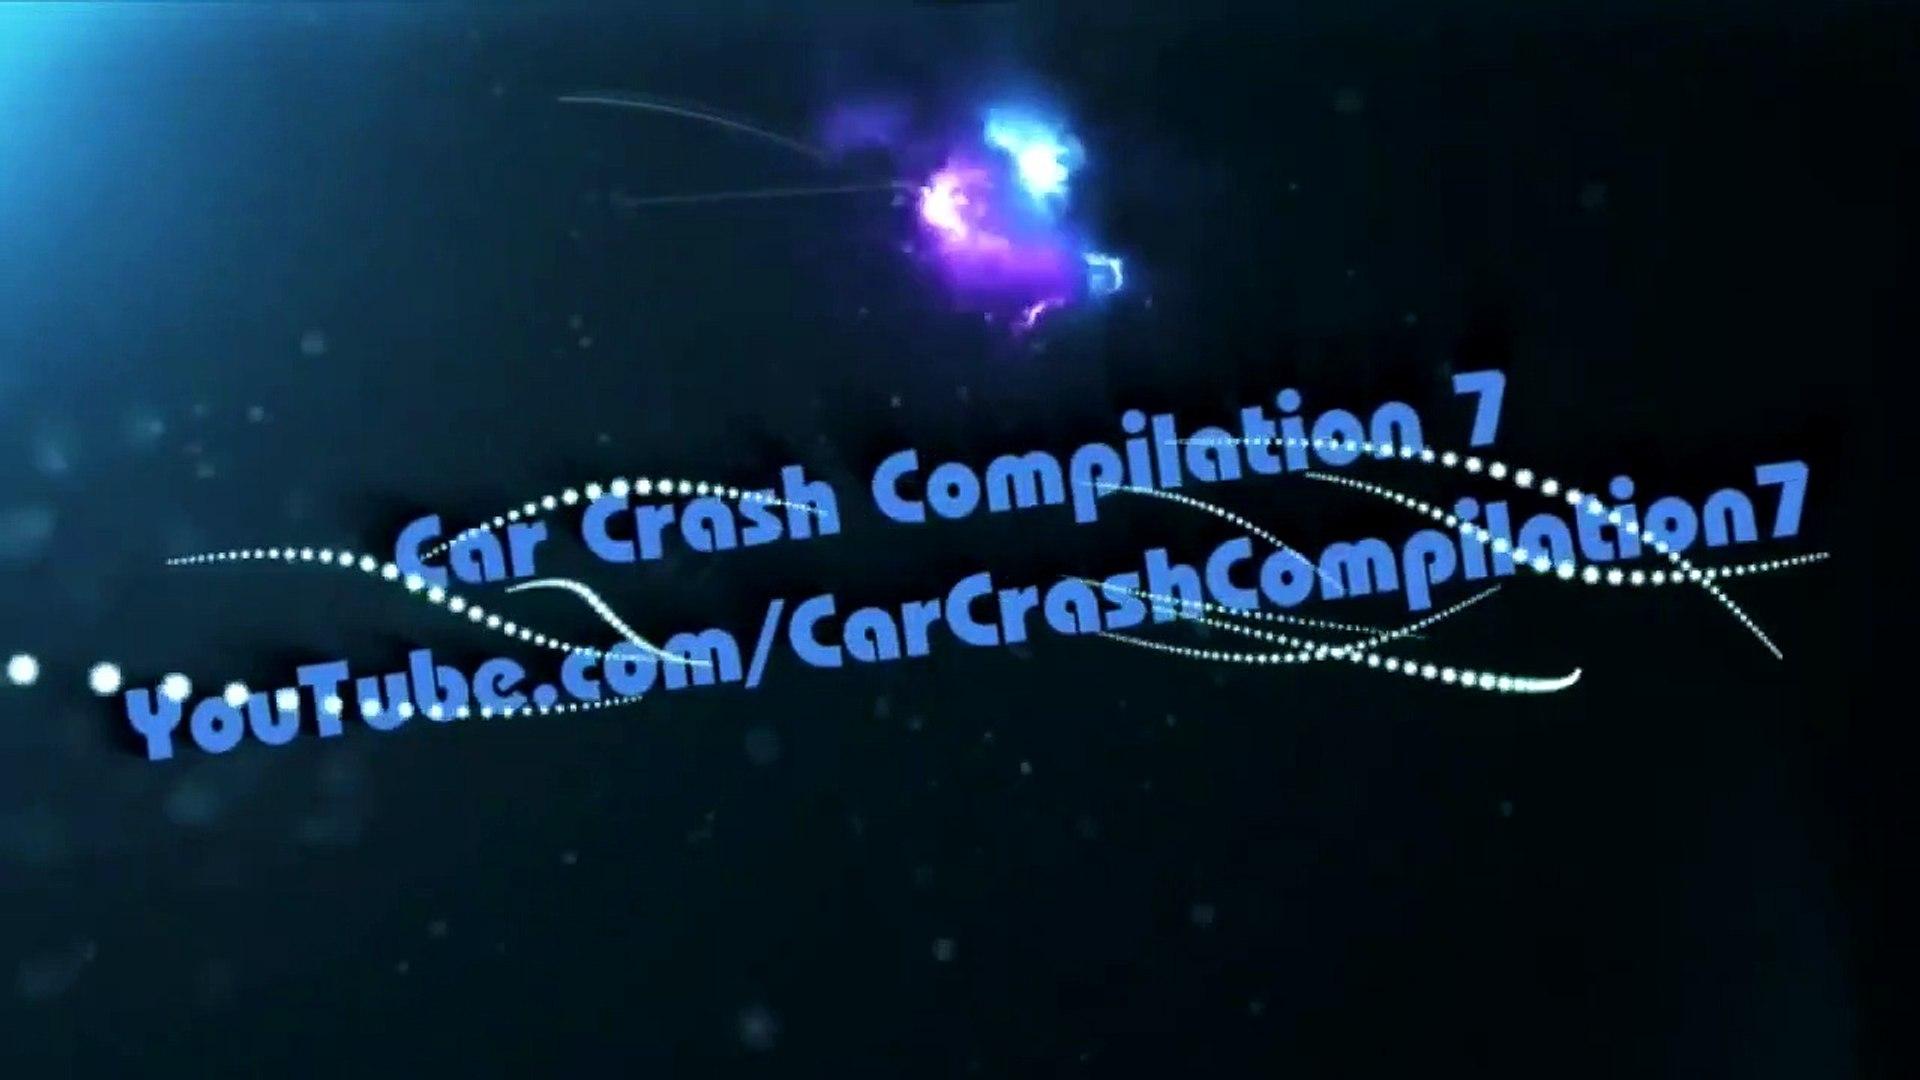 Car Crash Compilation 889 - Apr 2